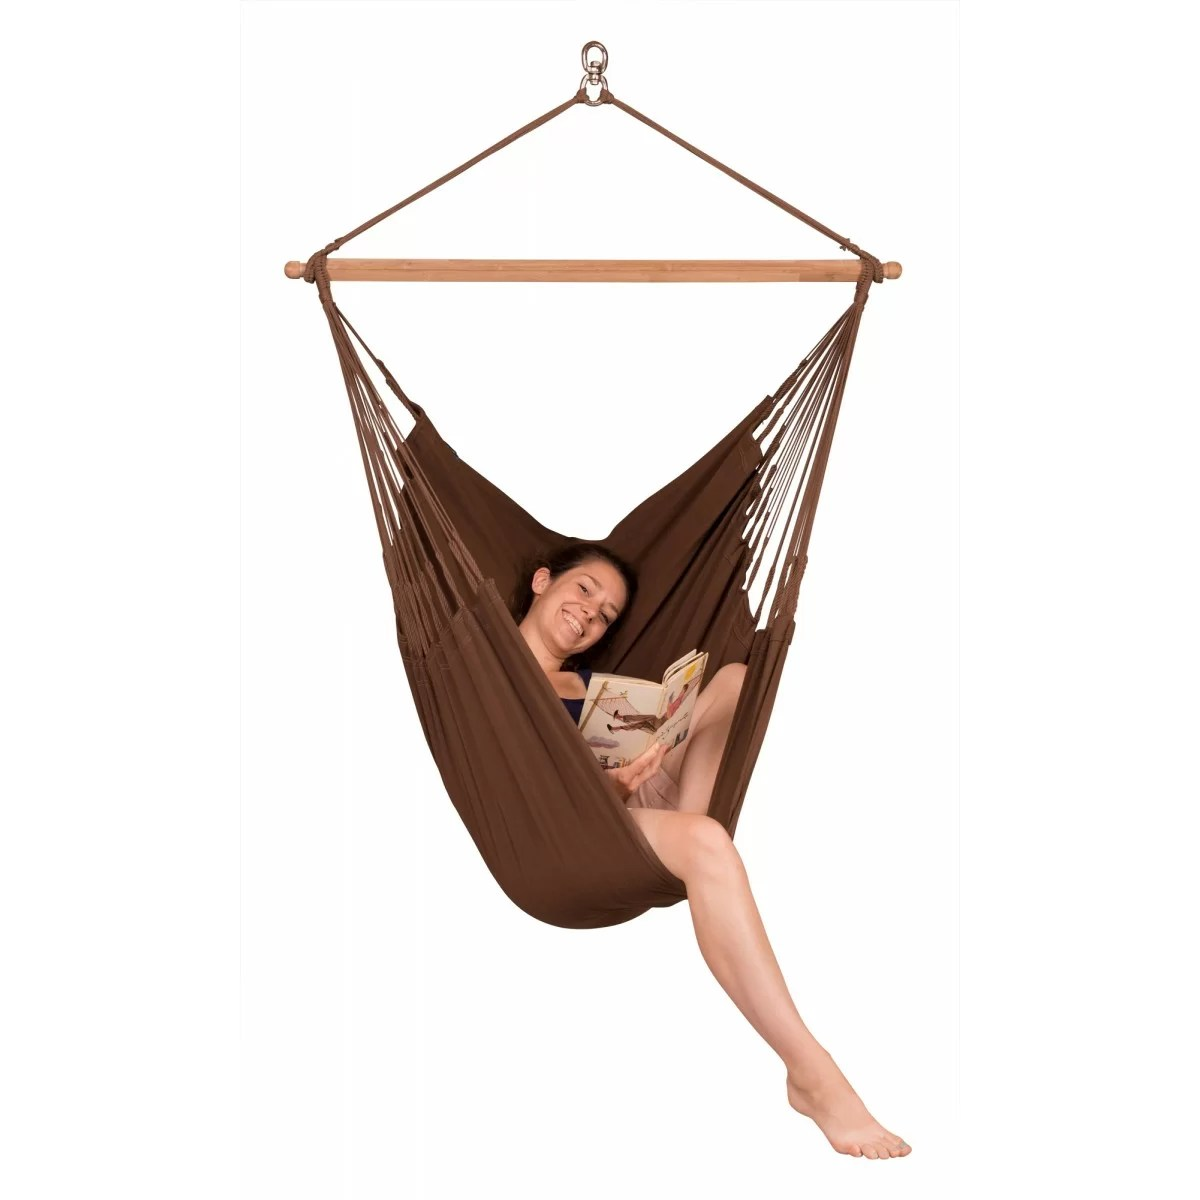 la siesta hammock chair ikea white desk basic modesta and reviews wayfair